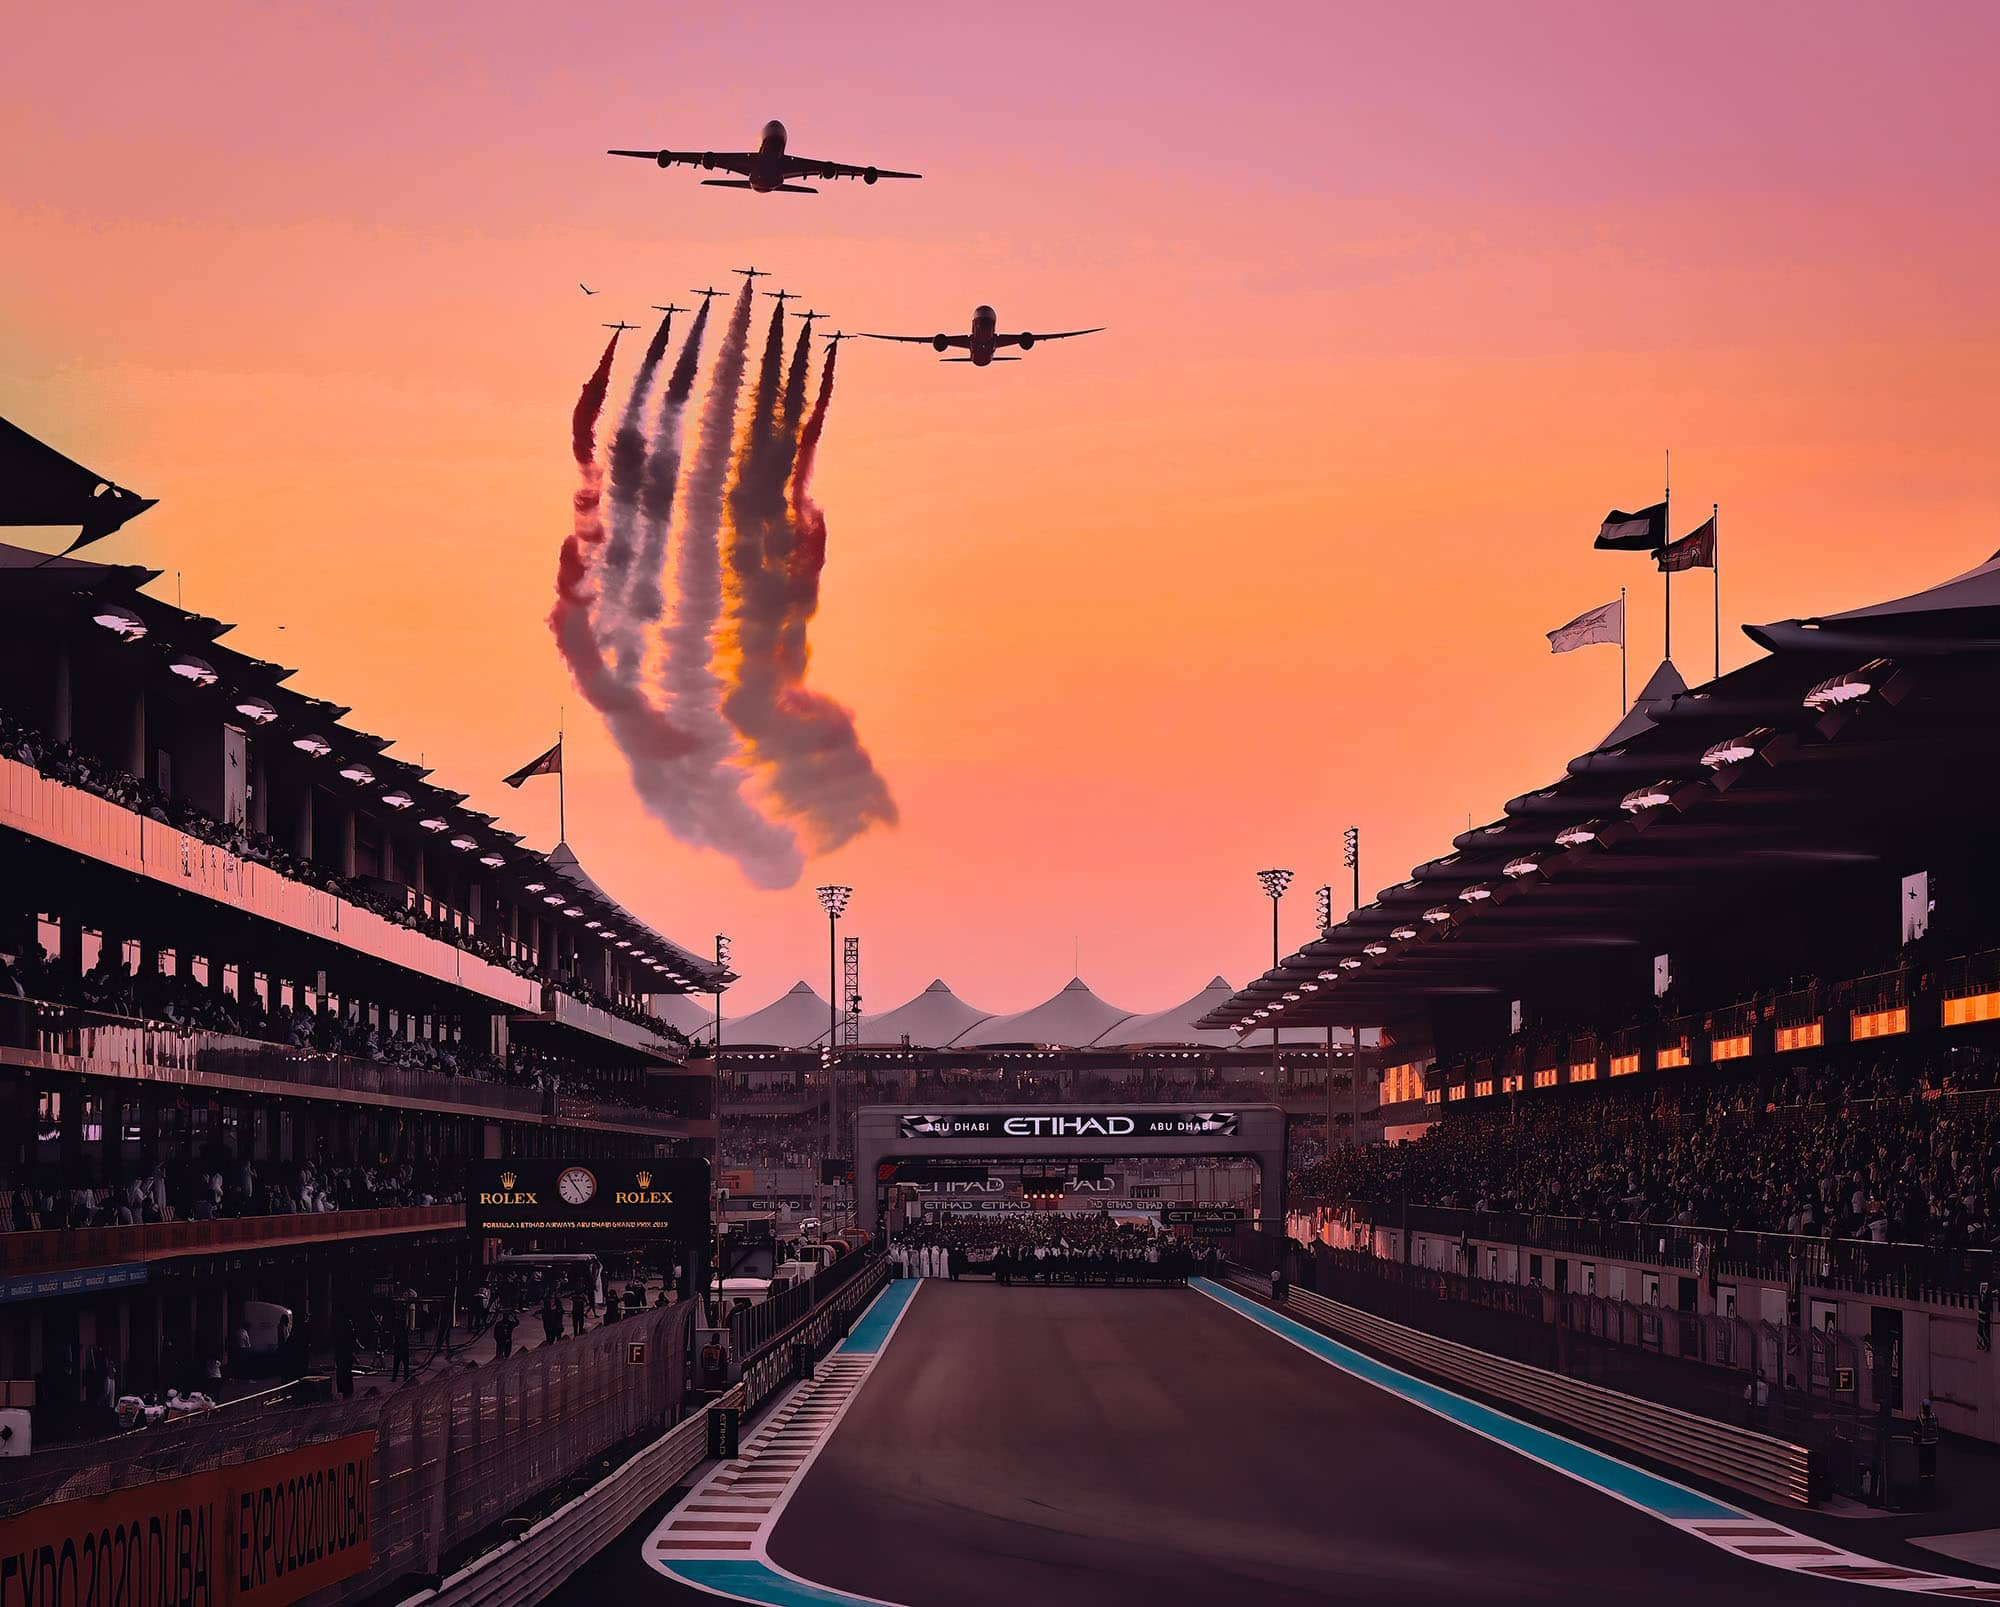 Formule 1 Abu Dhabi & Dubai World Expo